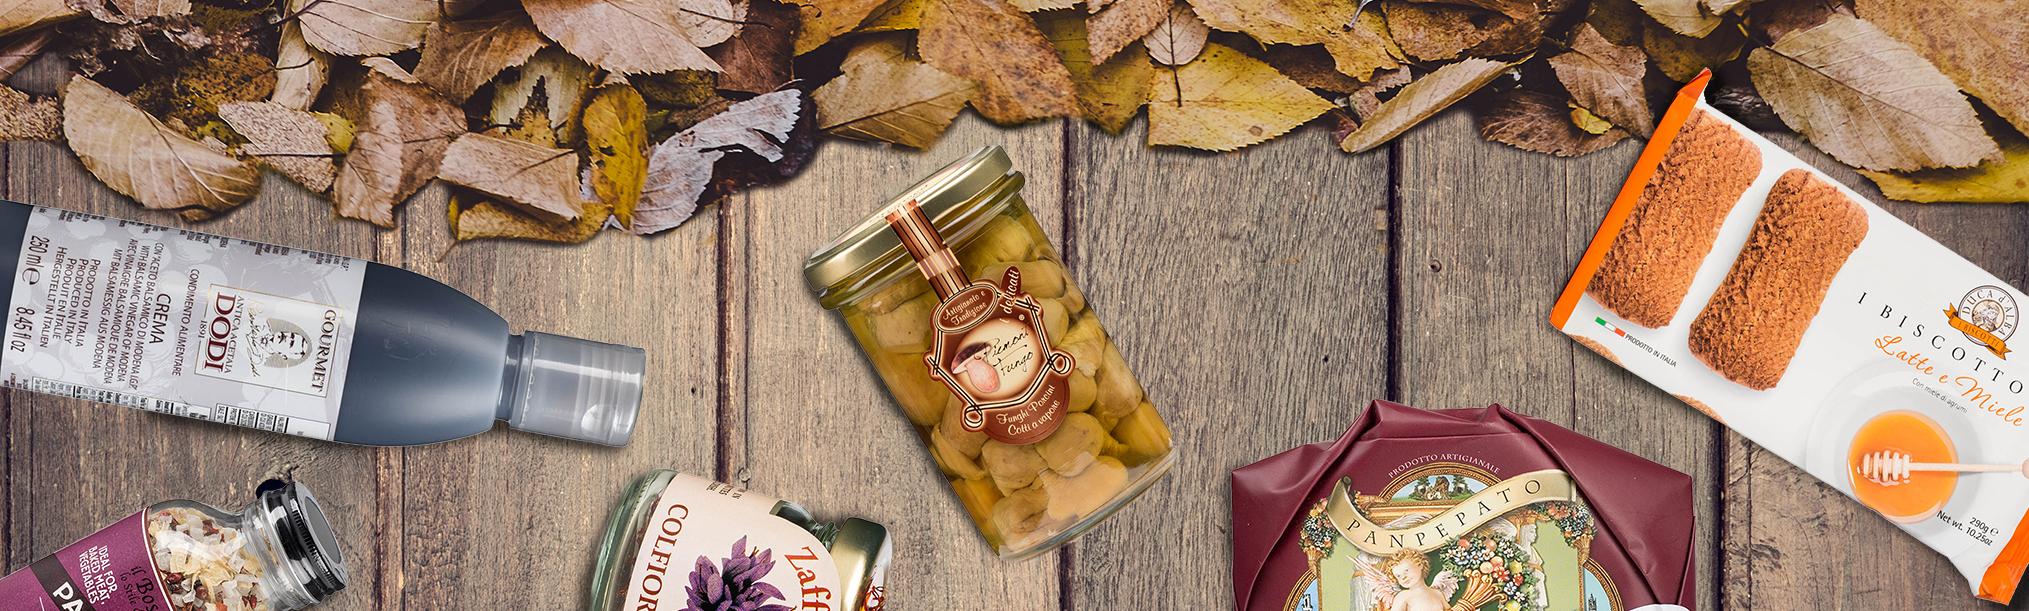 Trentino Alto Adige Artigianato welcome autumn | eataly